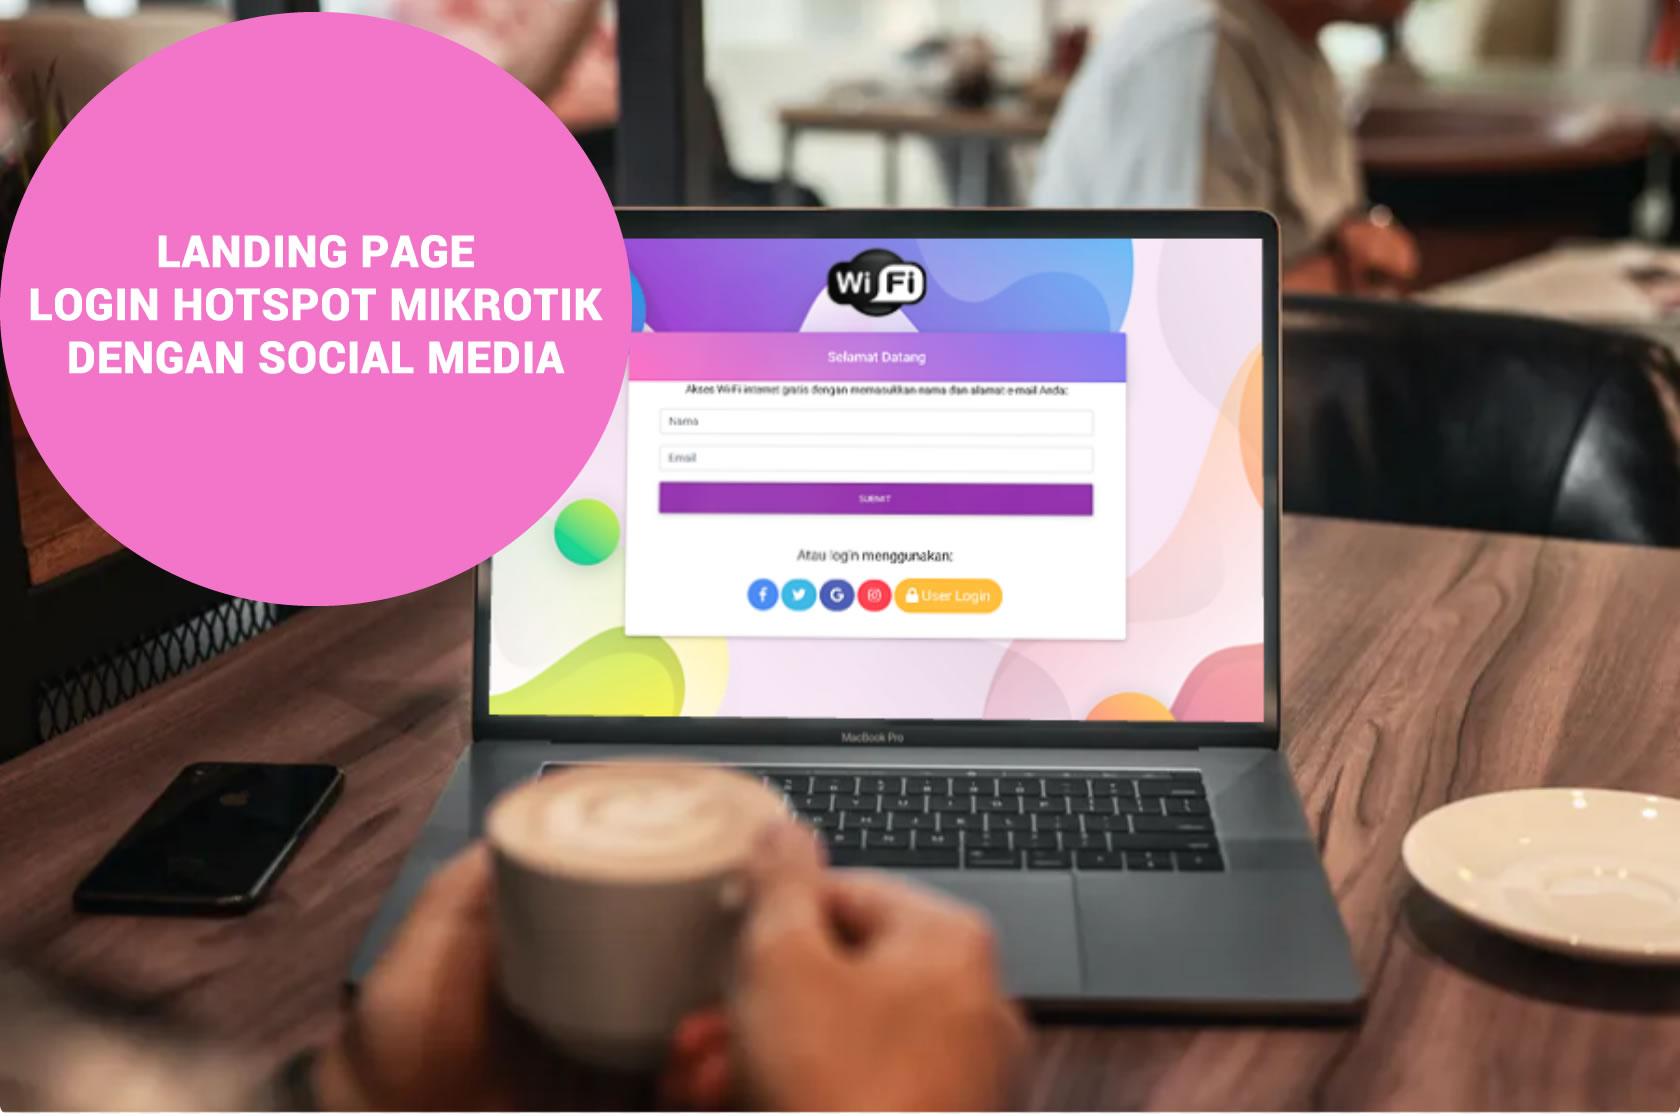 Landing page login hotspot mikrotik dengan media social